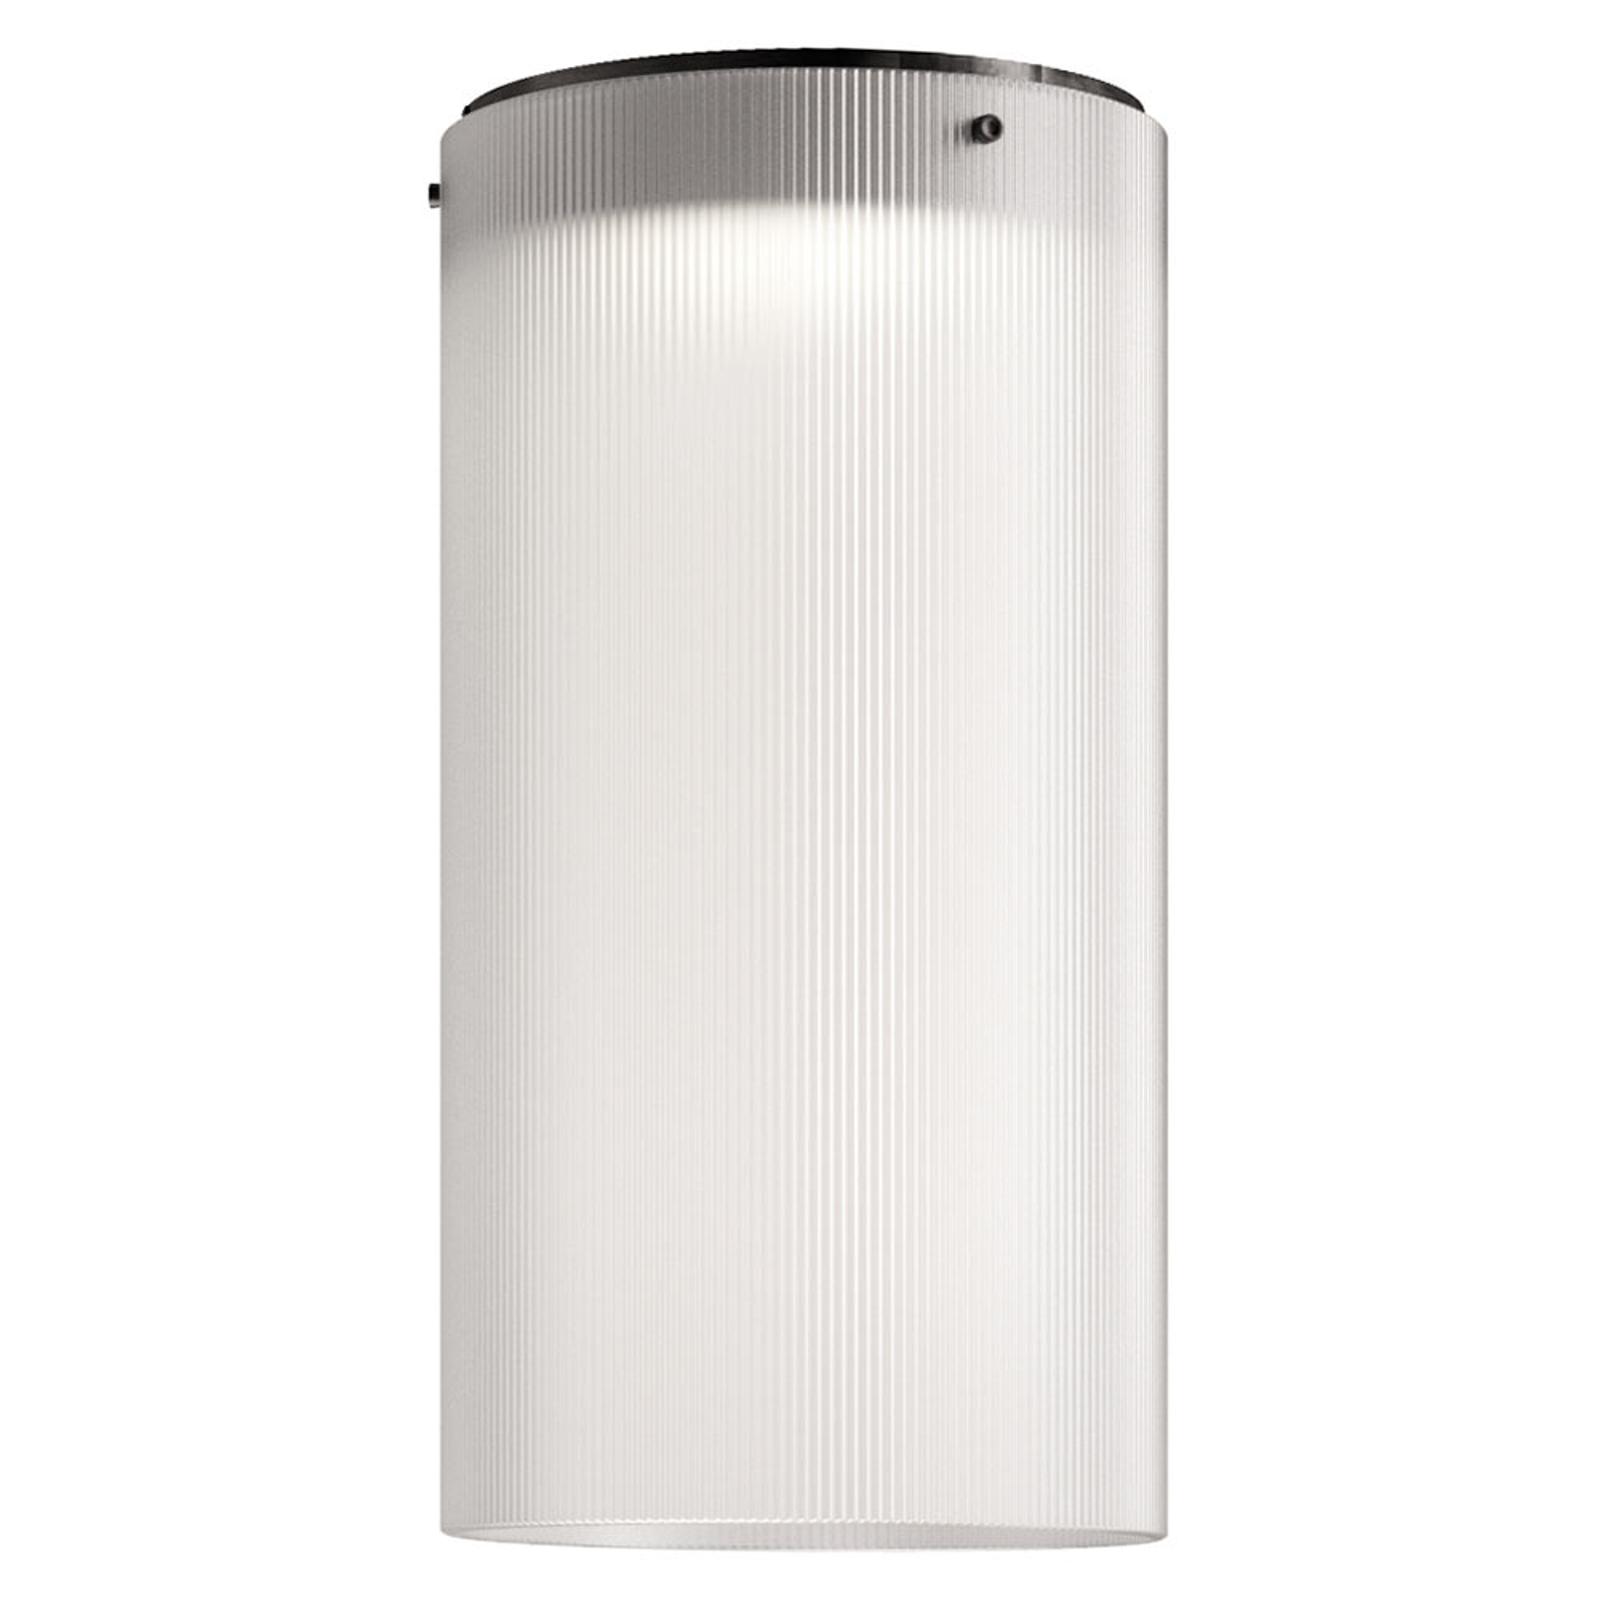 Kundalini Giass - lampa sufitowa LED Ø25 cm, biała